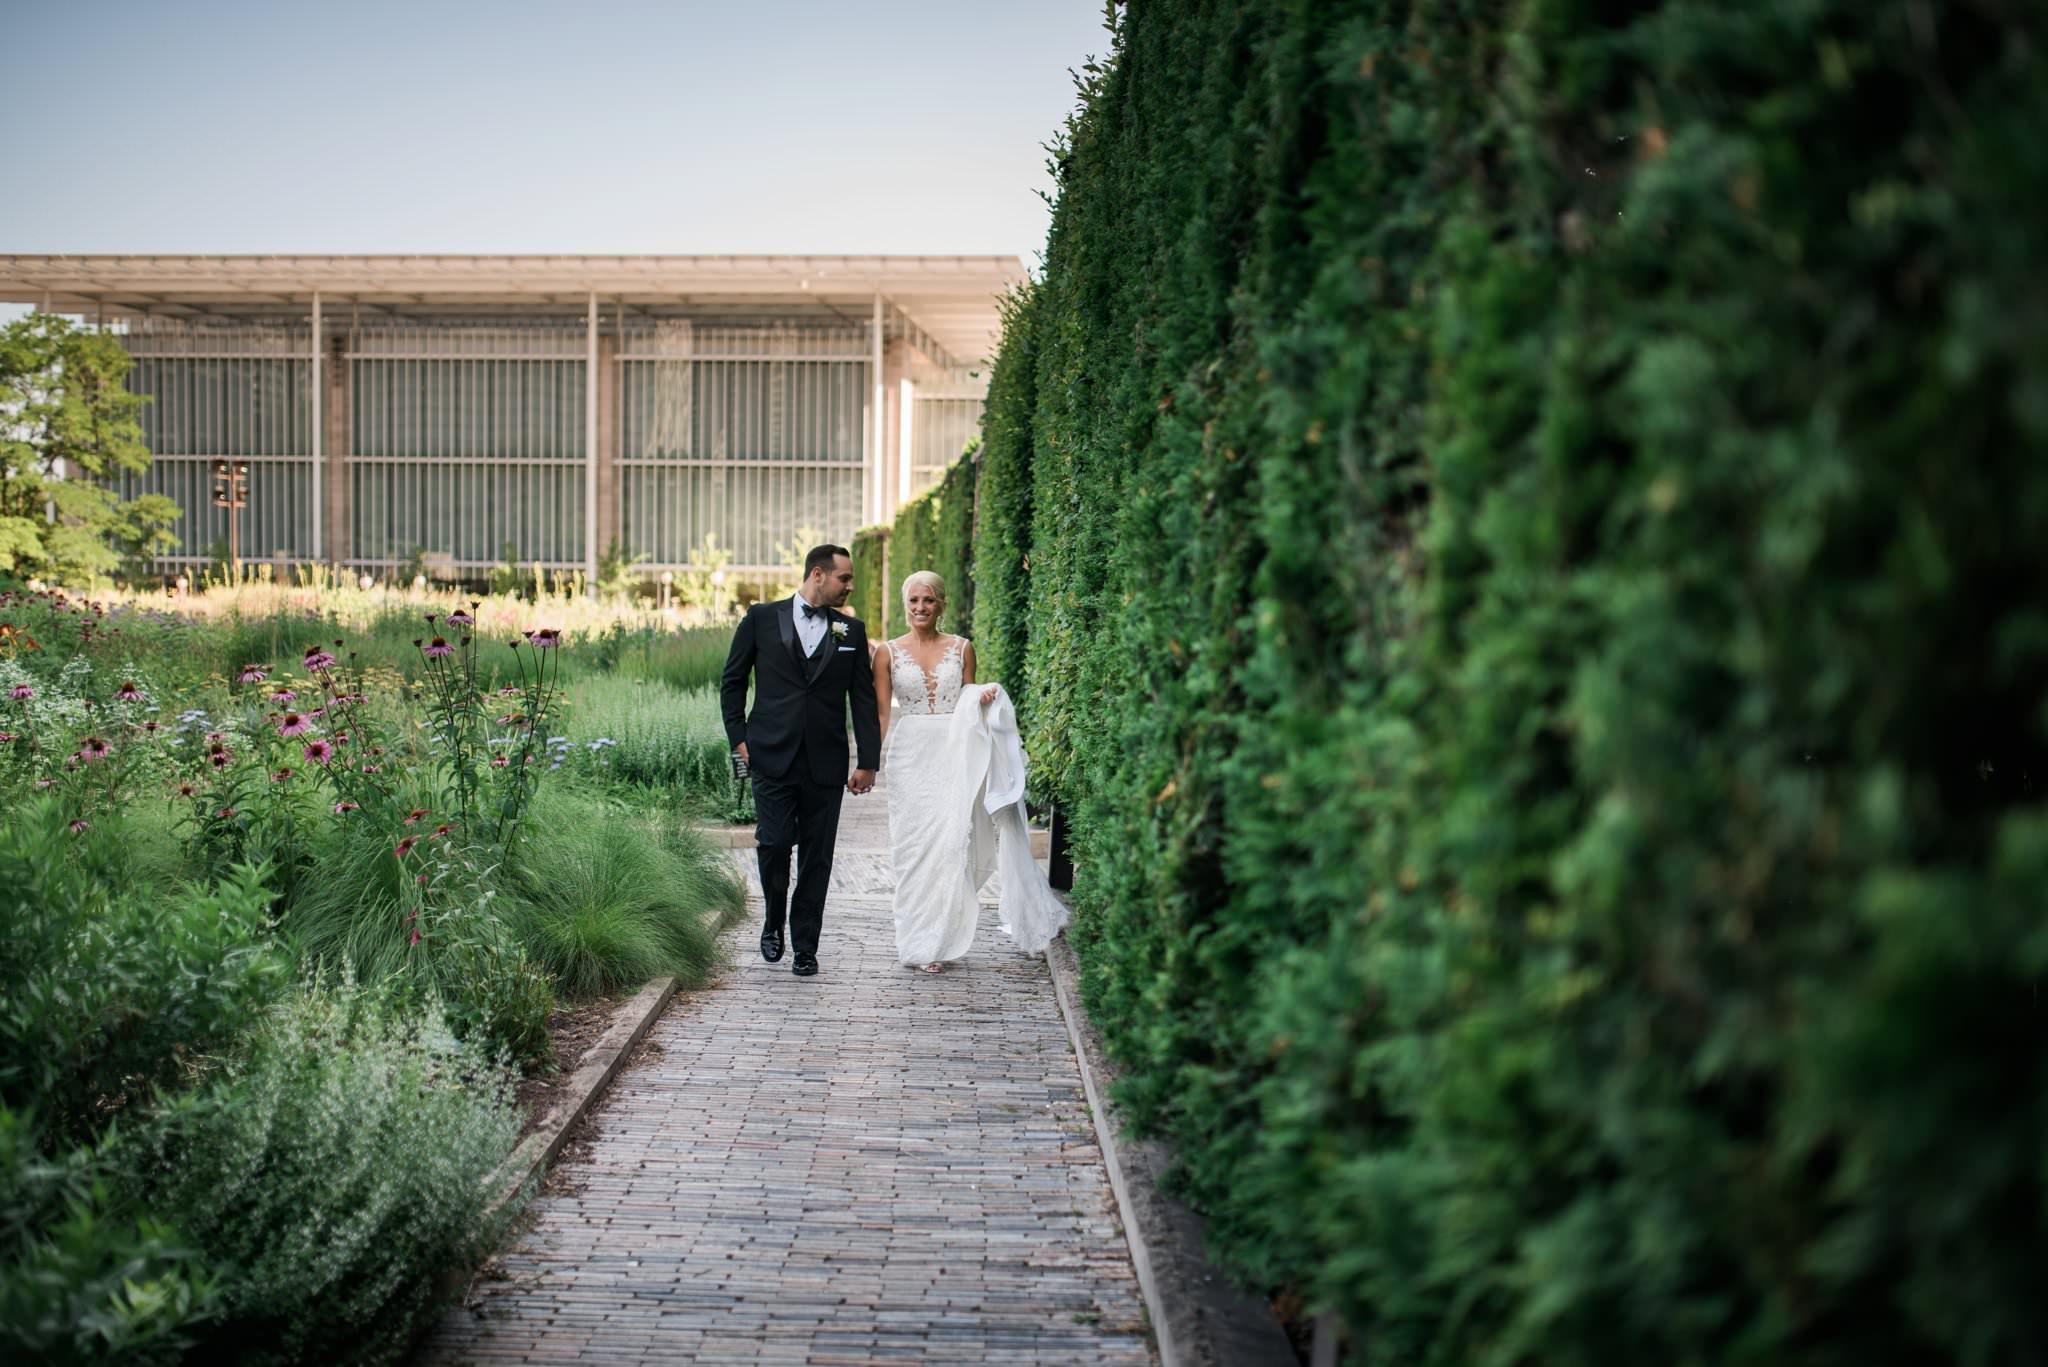 Adler-Planetarium-Chicago-Wedding-Photography-0048.JPG